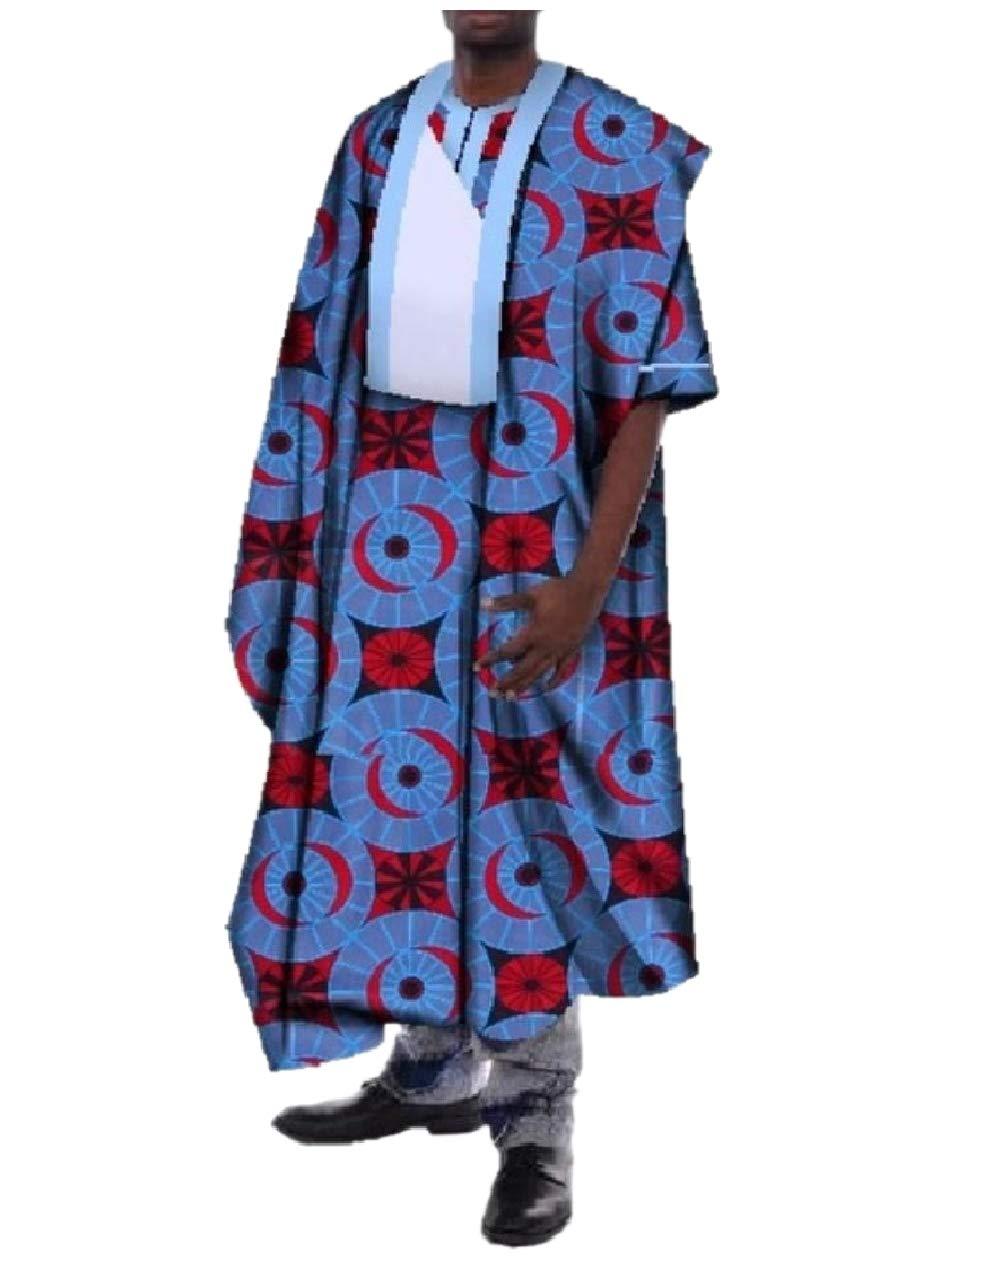 Tootless Men Premium Dashiki African Printed Ankle Length Back Cotton Robe Blue S